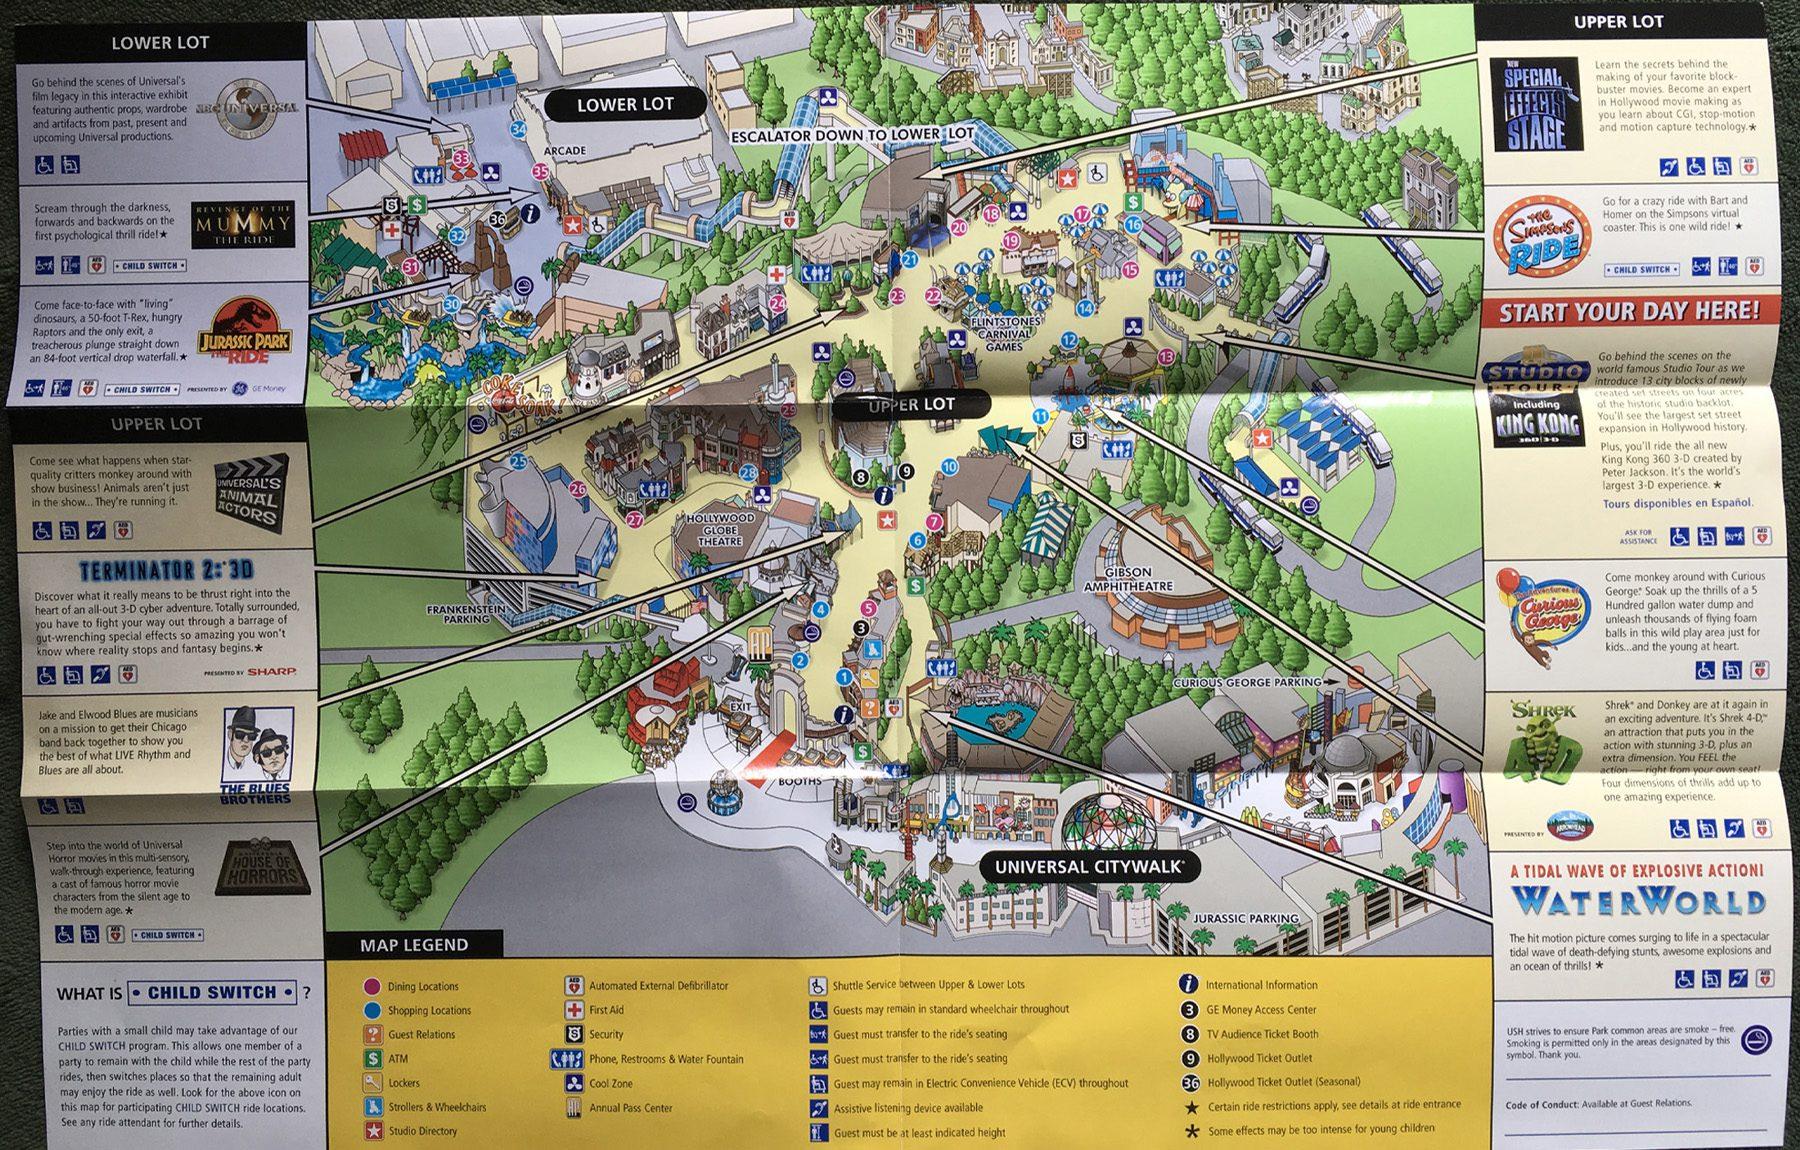 2010 Universal Studios Hollywood Map